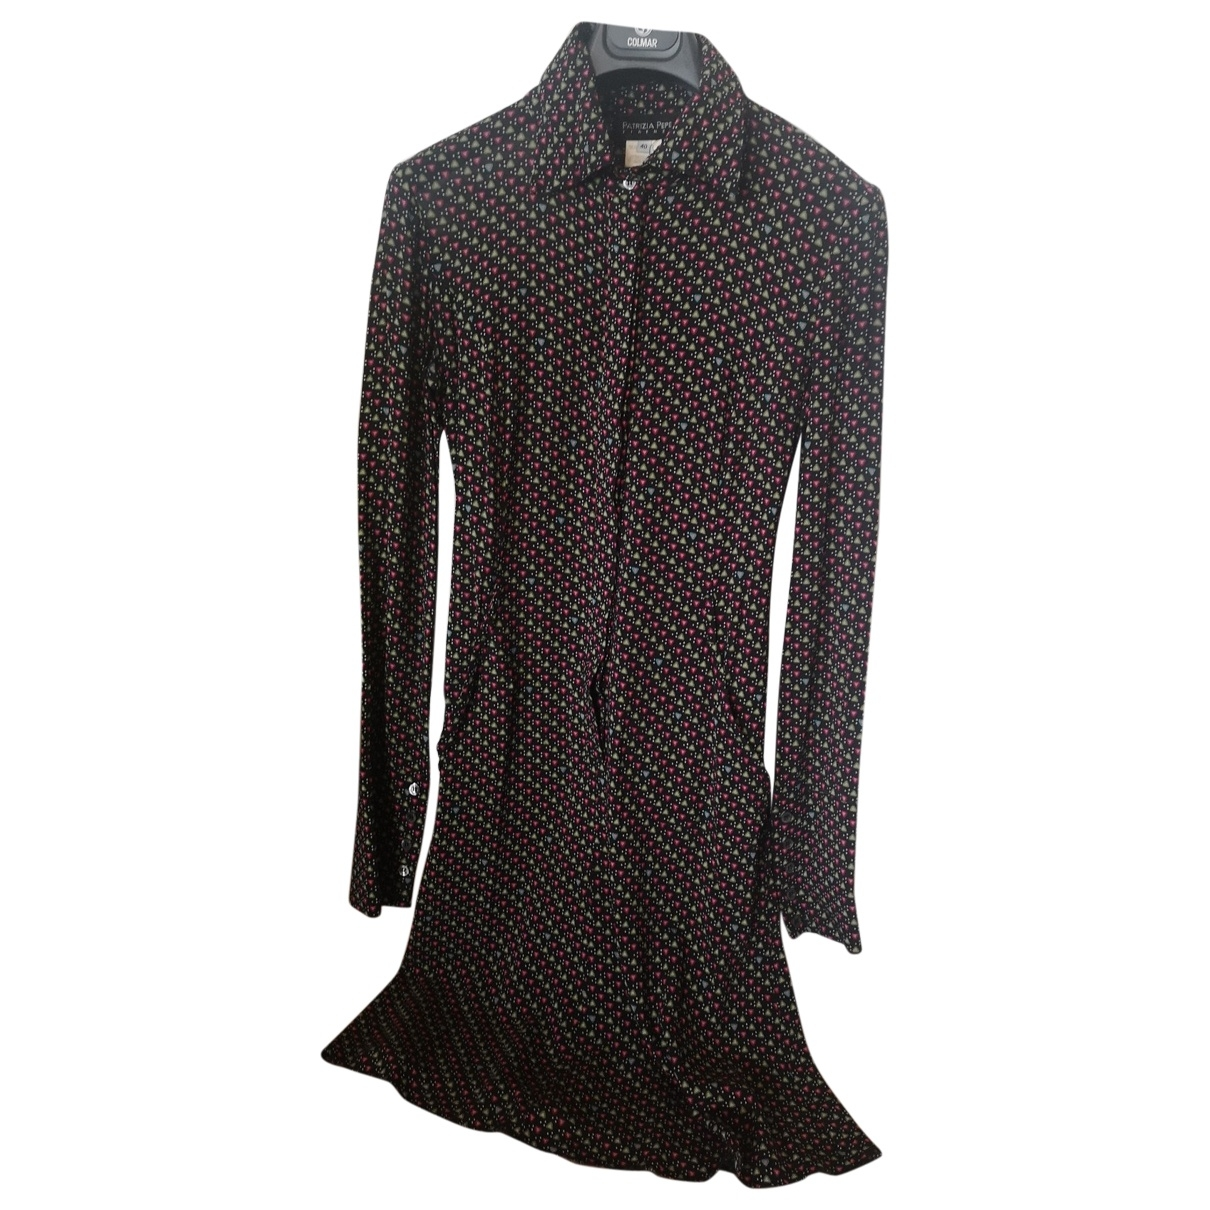 Patrizia Pepe \N Black dress for Women 40 FR